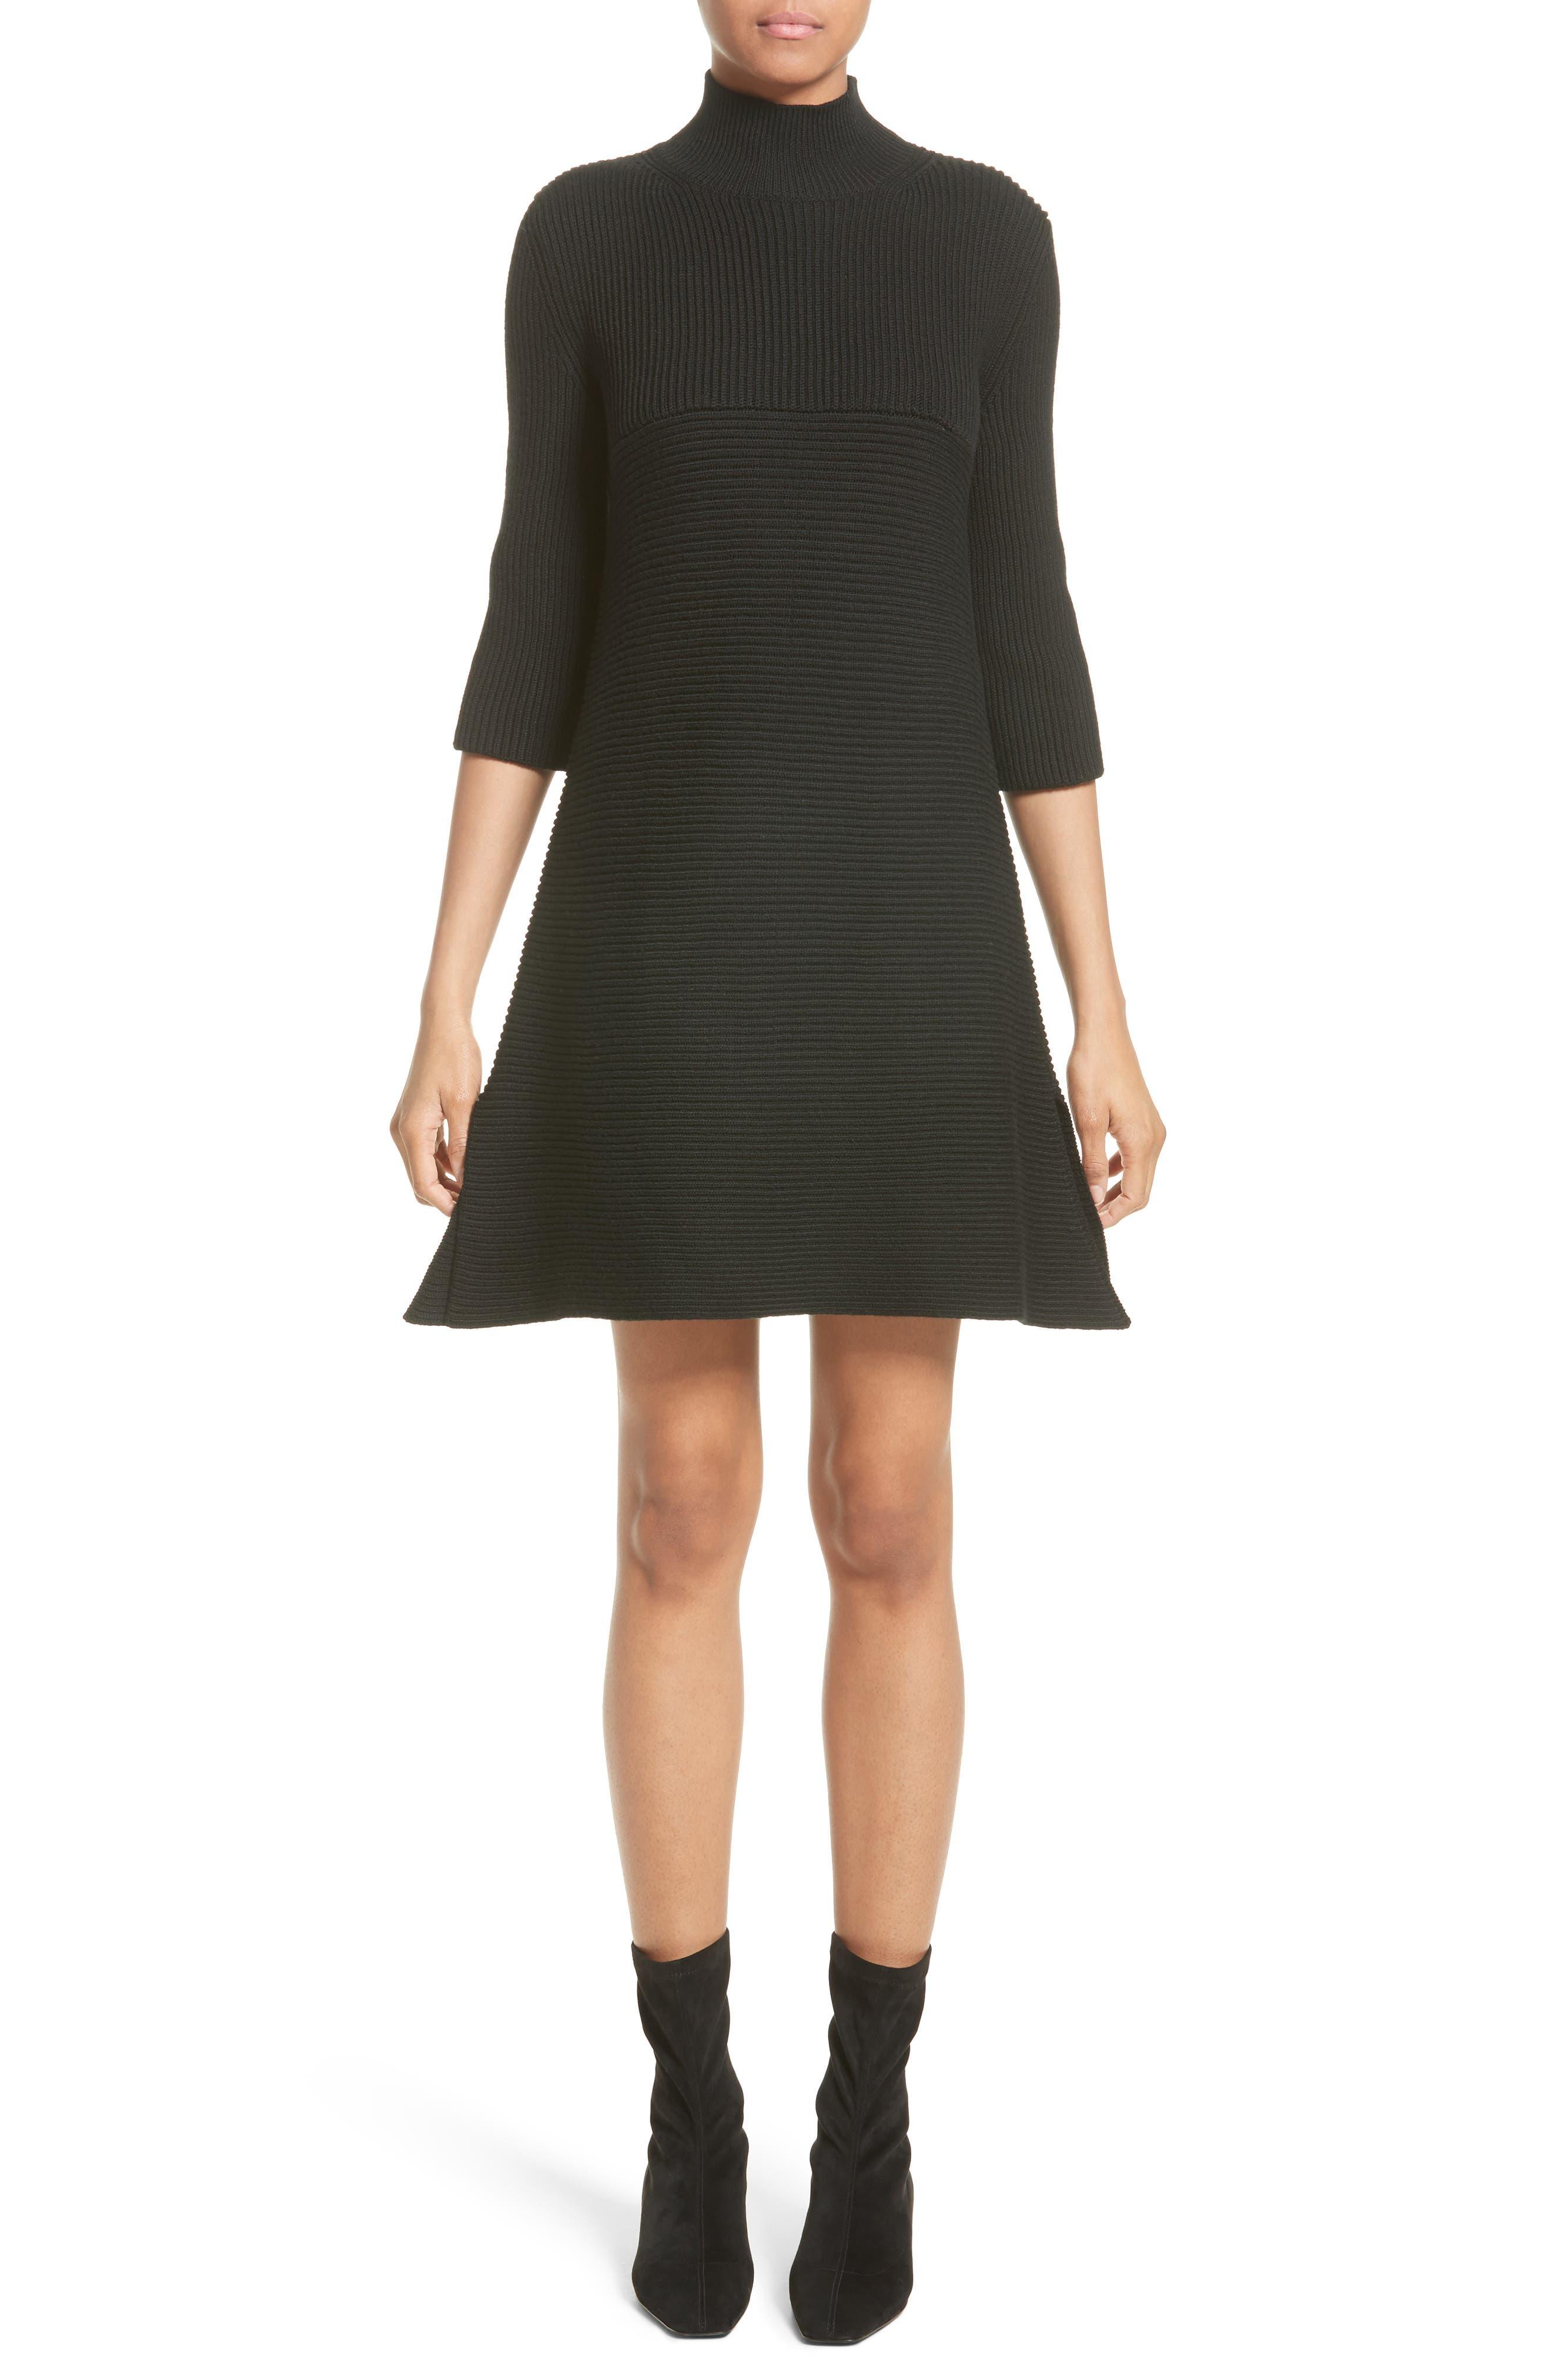 Stella McCartney Virgin Wool Rib Knit Dress